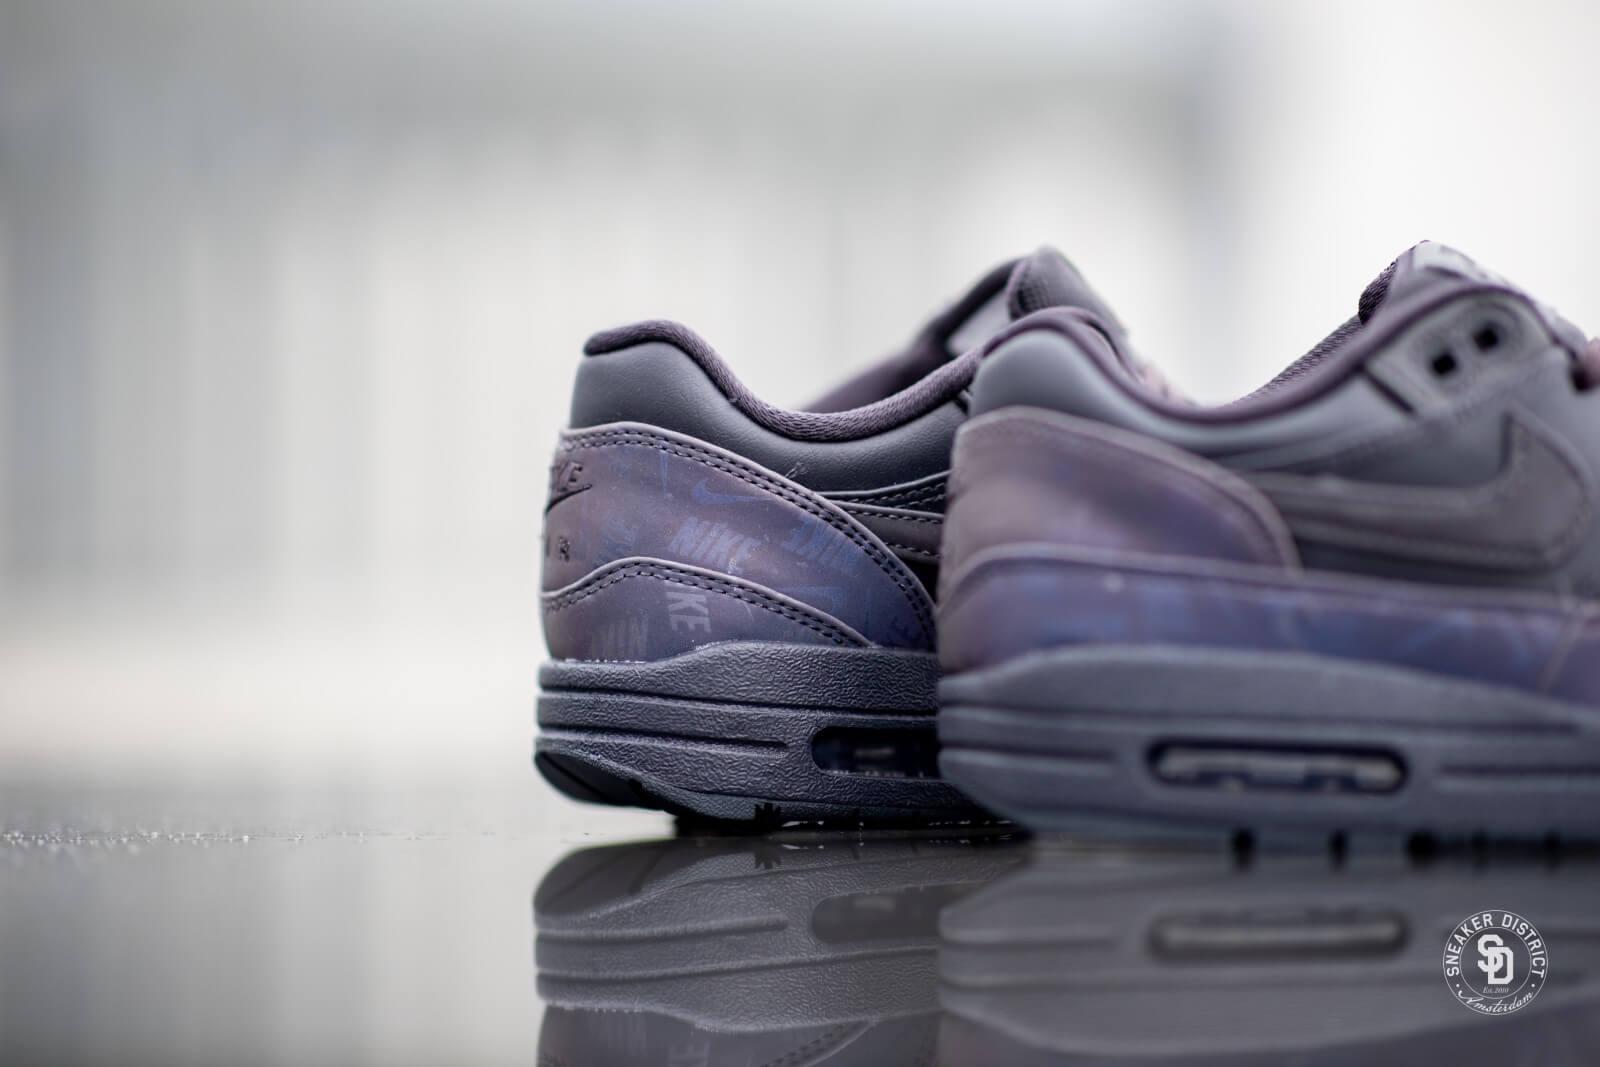 Nike Women's Air Max 1 LX Oil Grey